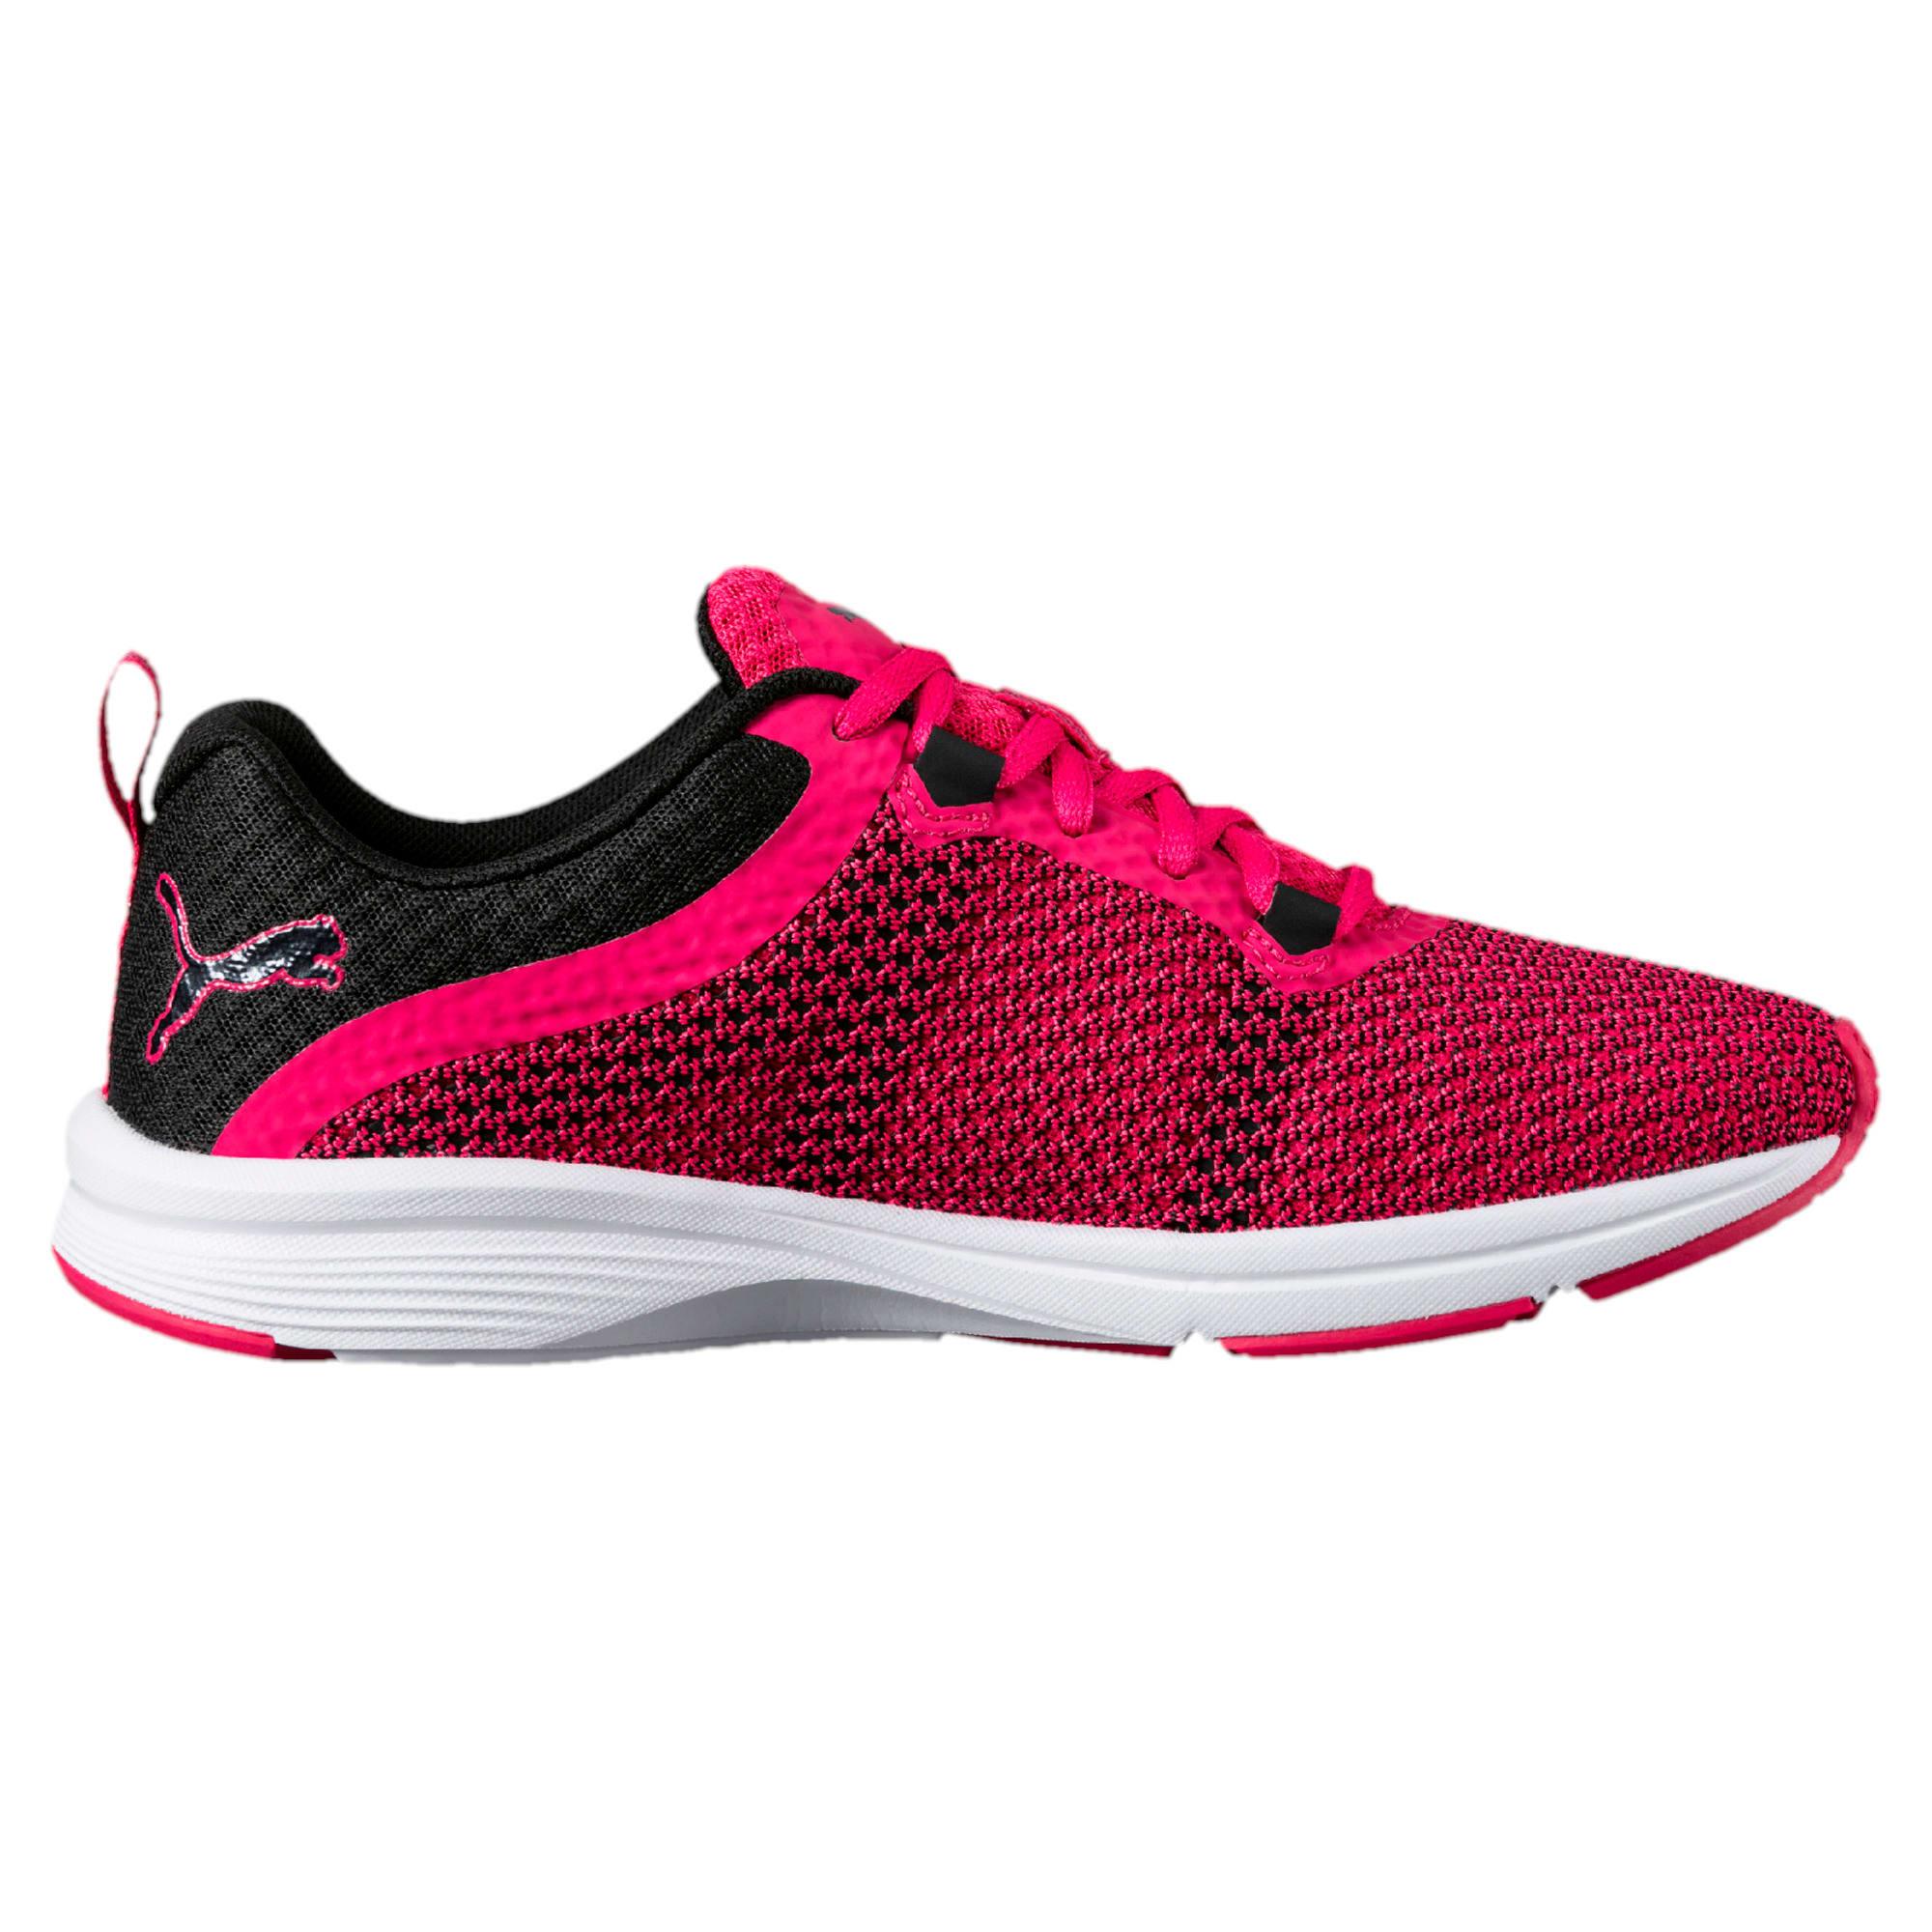 Thumbnail 5 of Pulse IGNITE XT Women's Training Shoes, Love Potion-Puma Black, medium-IND